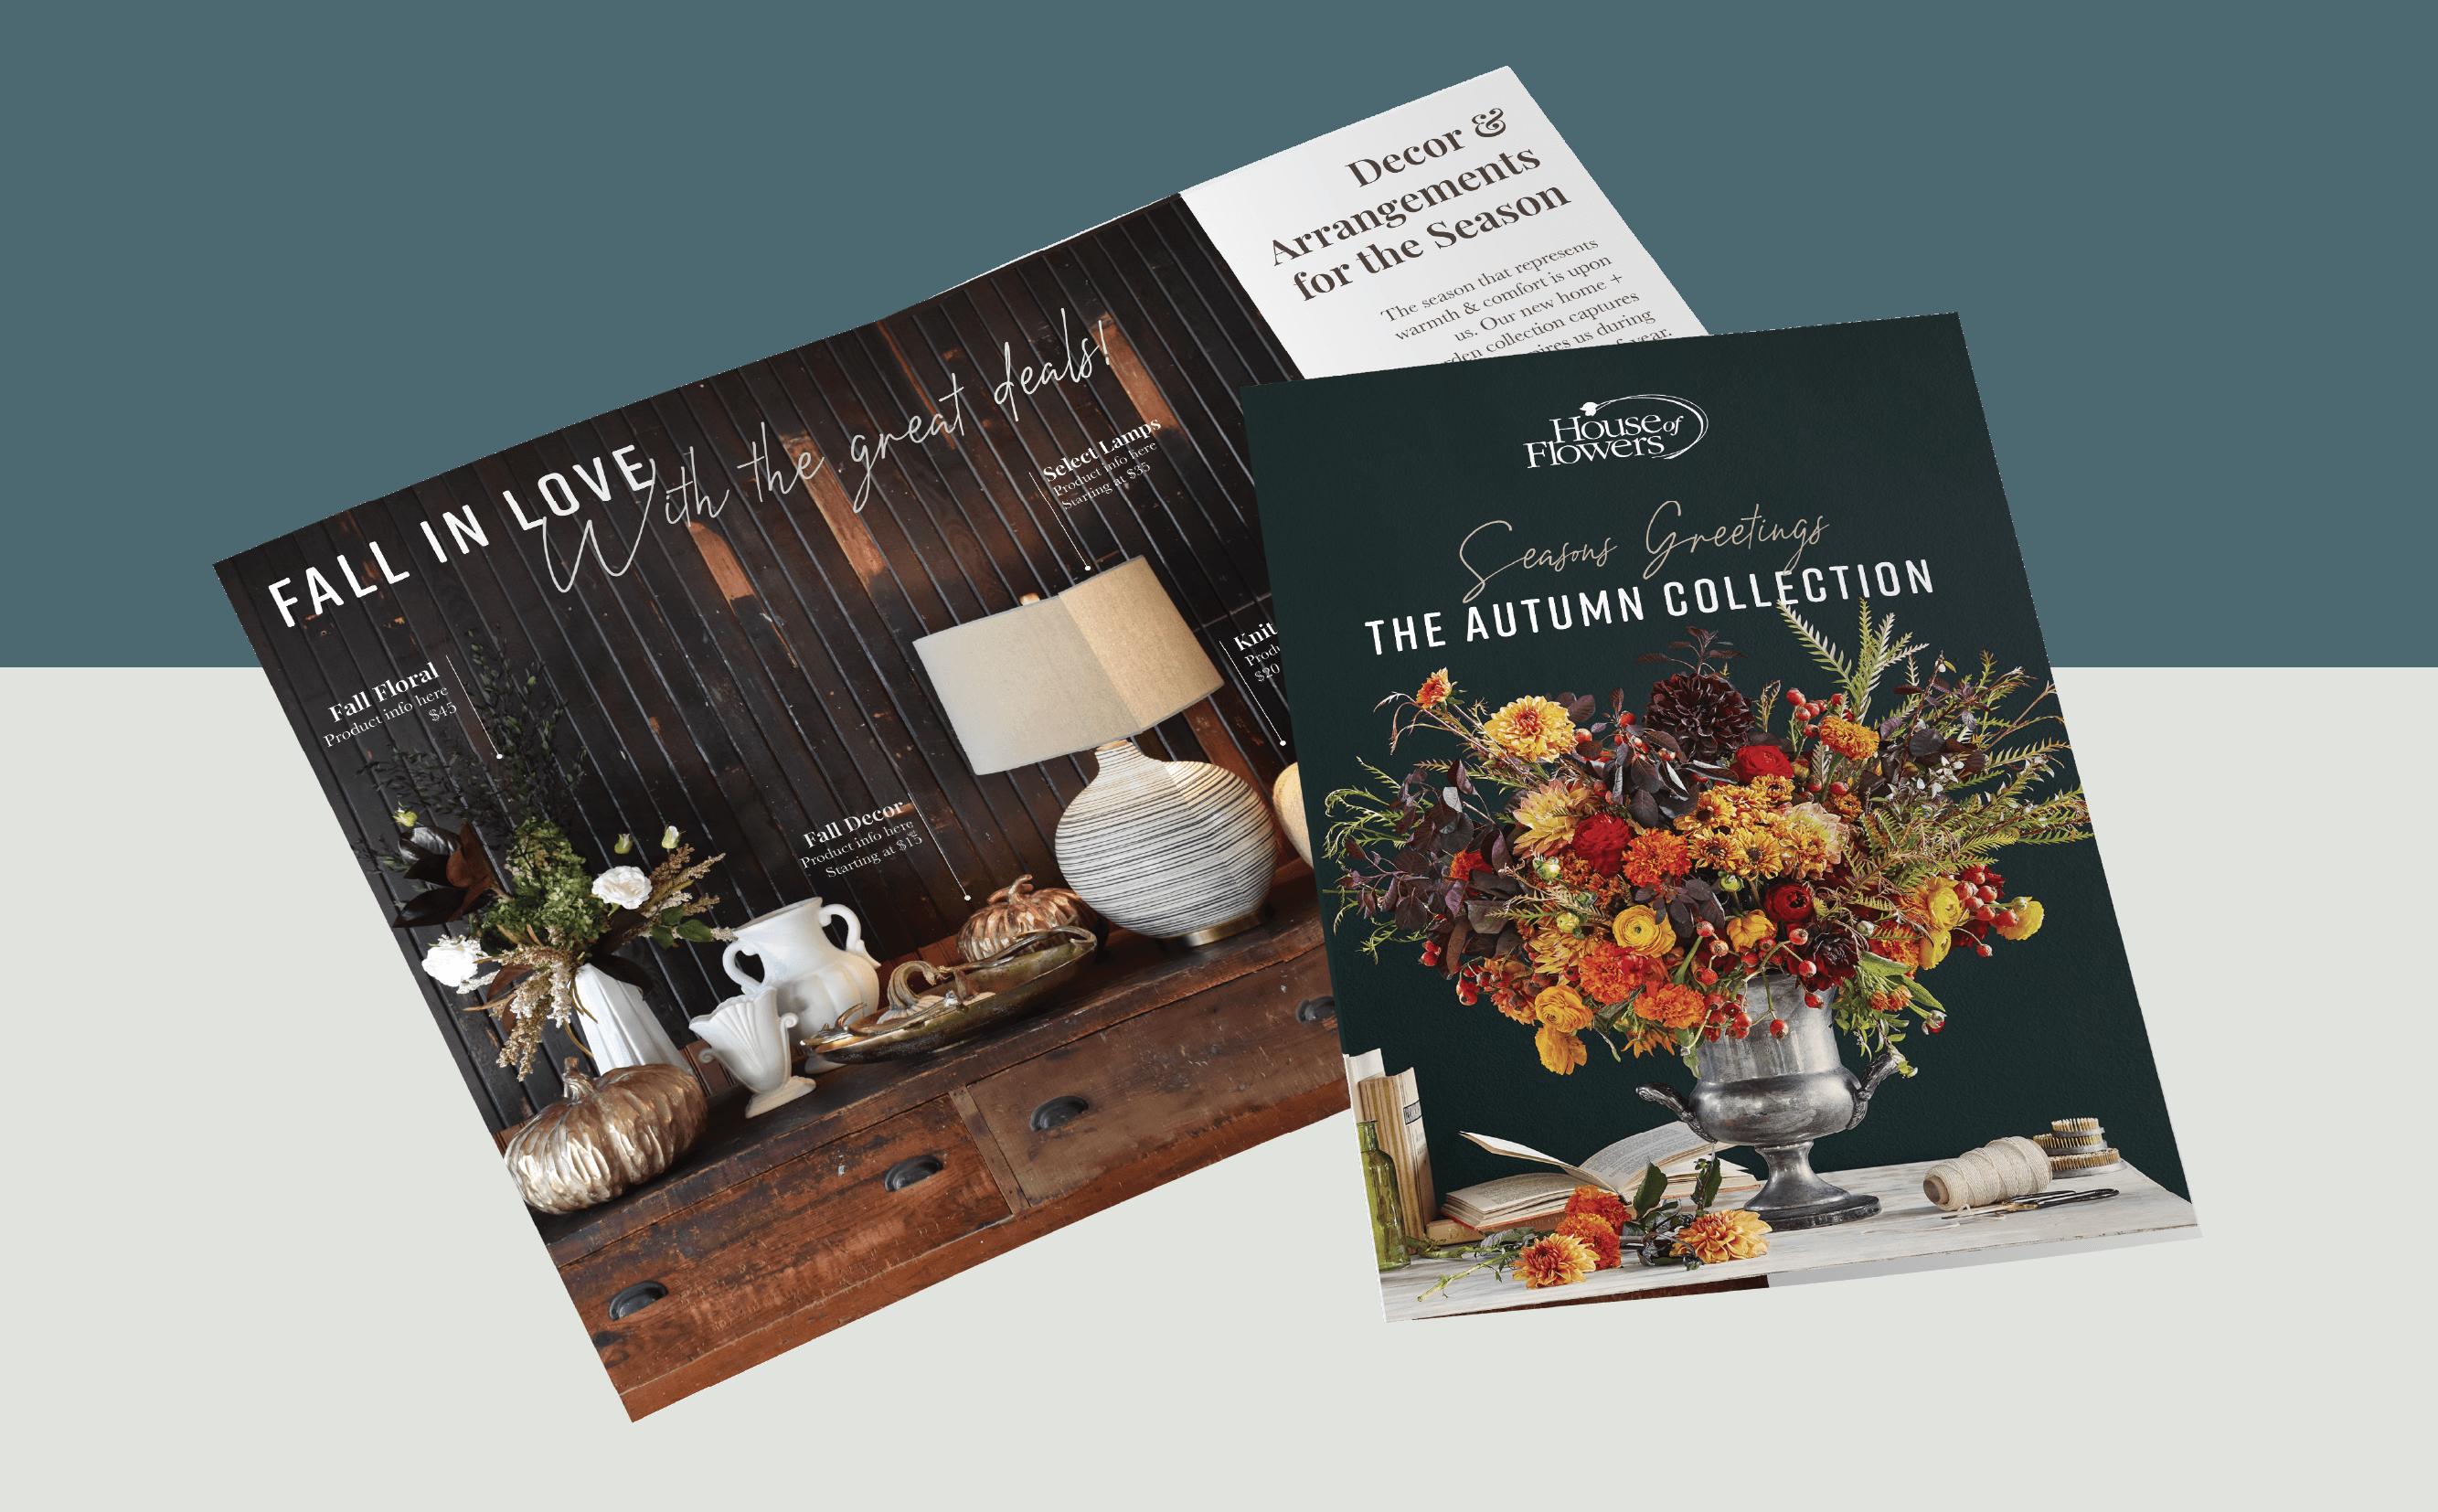 House of Flowers catalog booklet mockup.